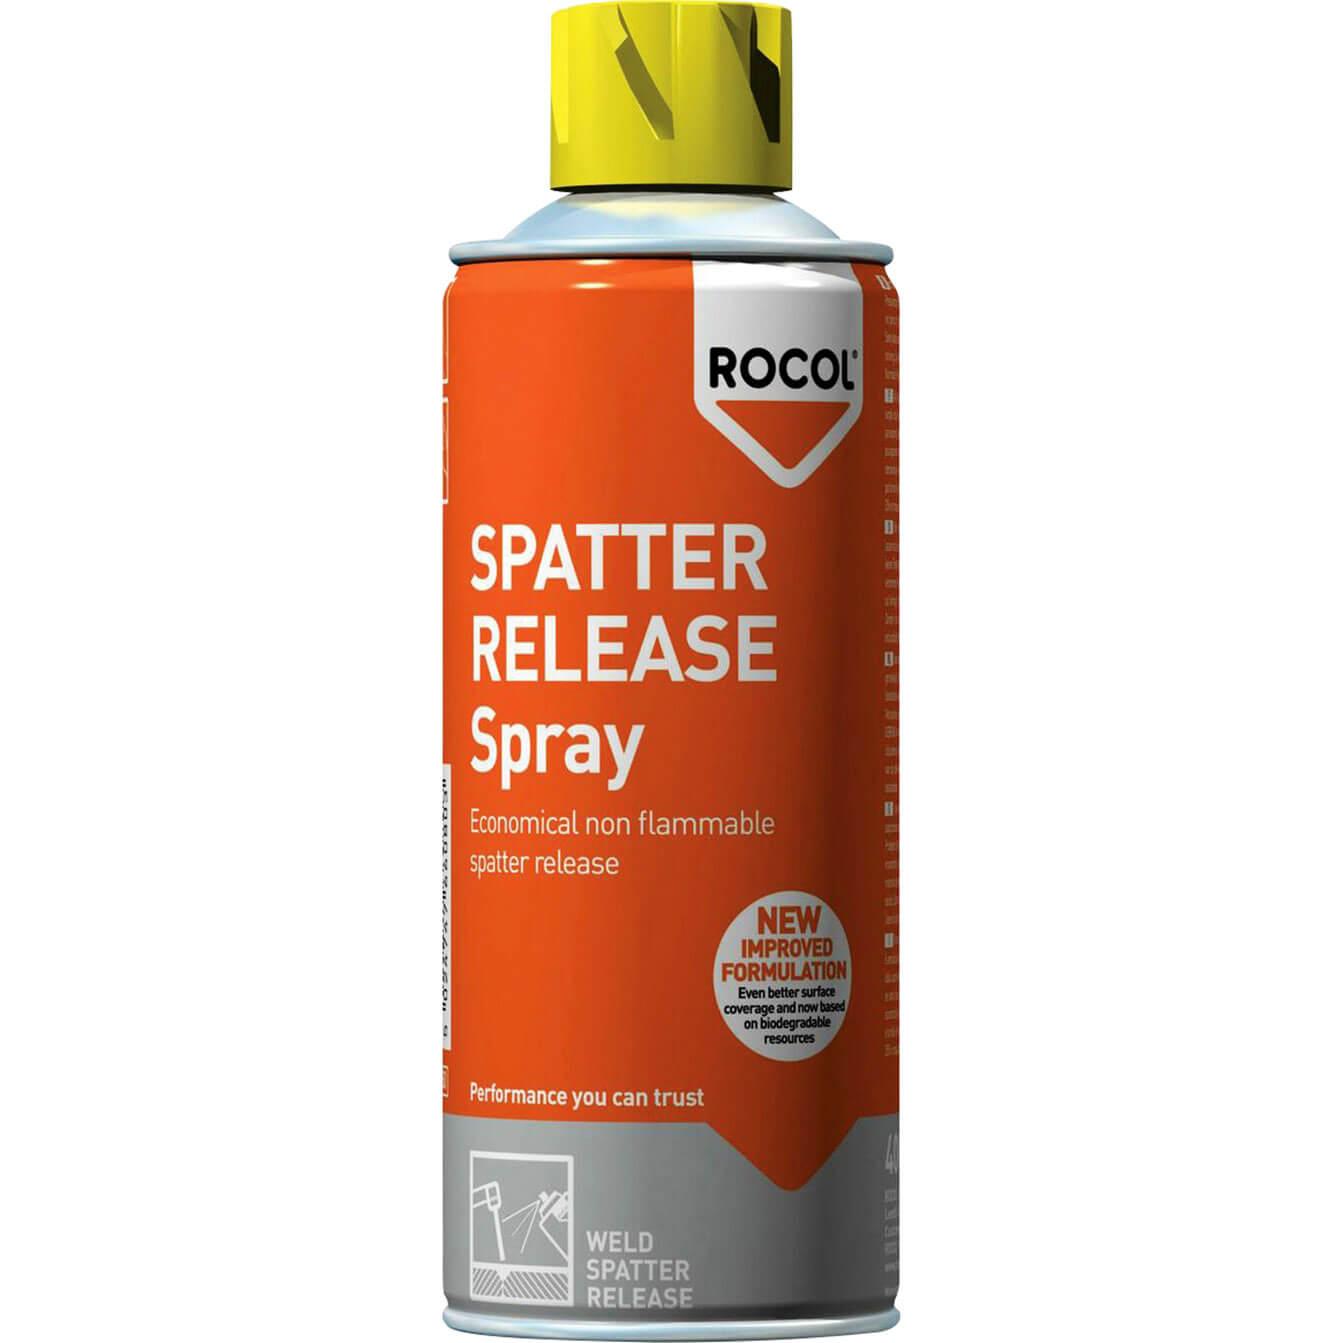 Image of Rocol Welders Anti Spatter Release Spray 300ml